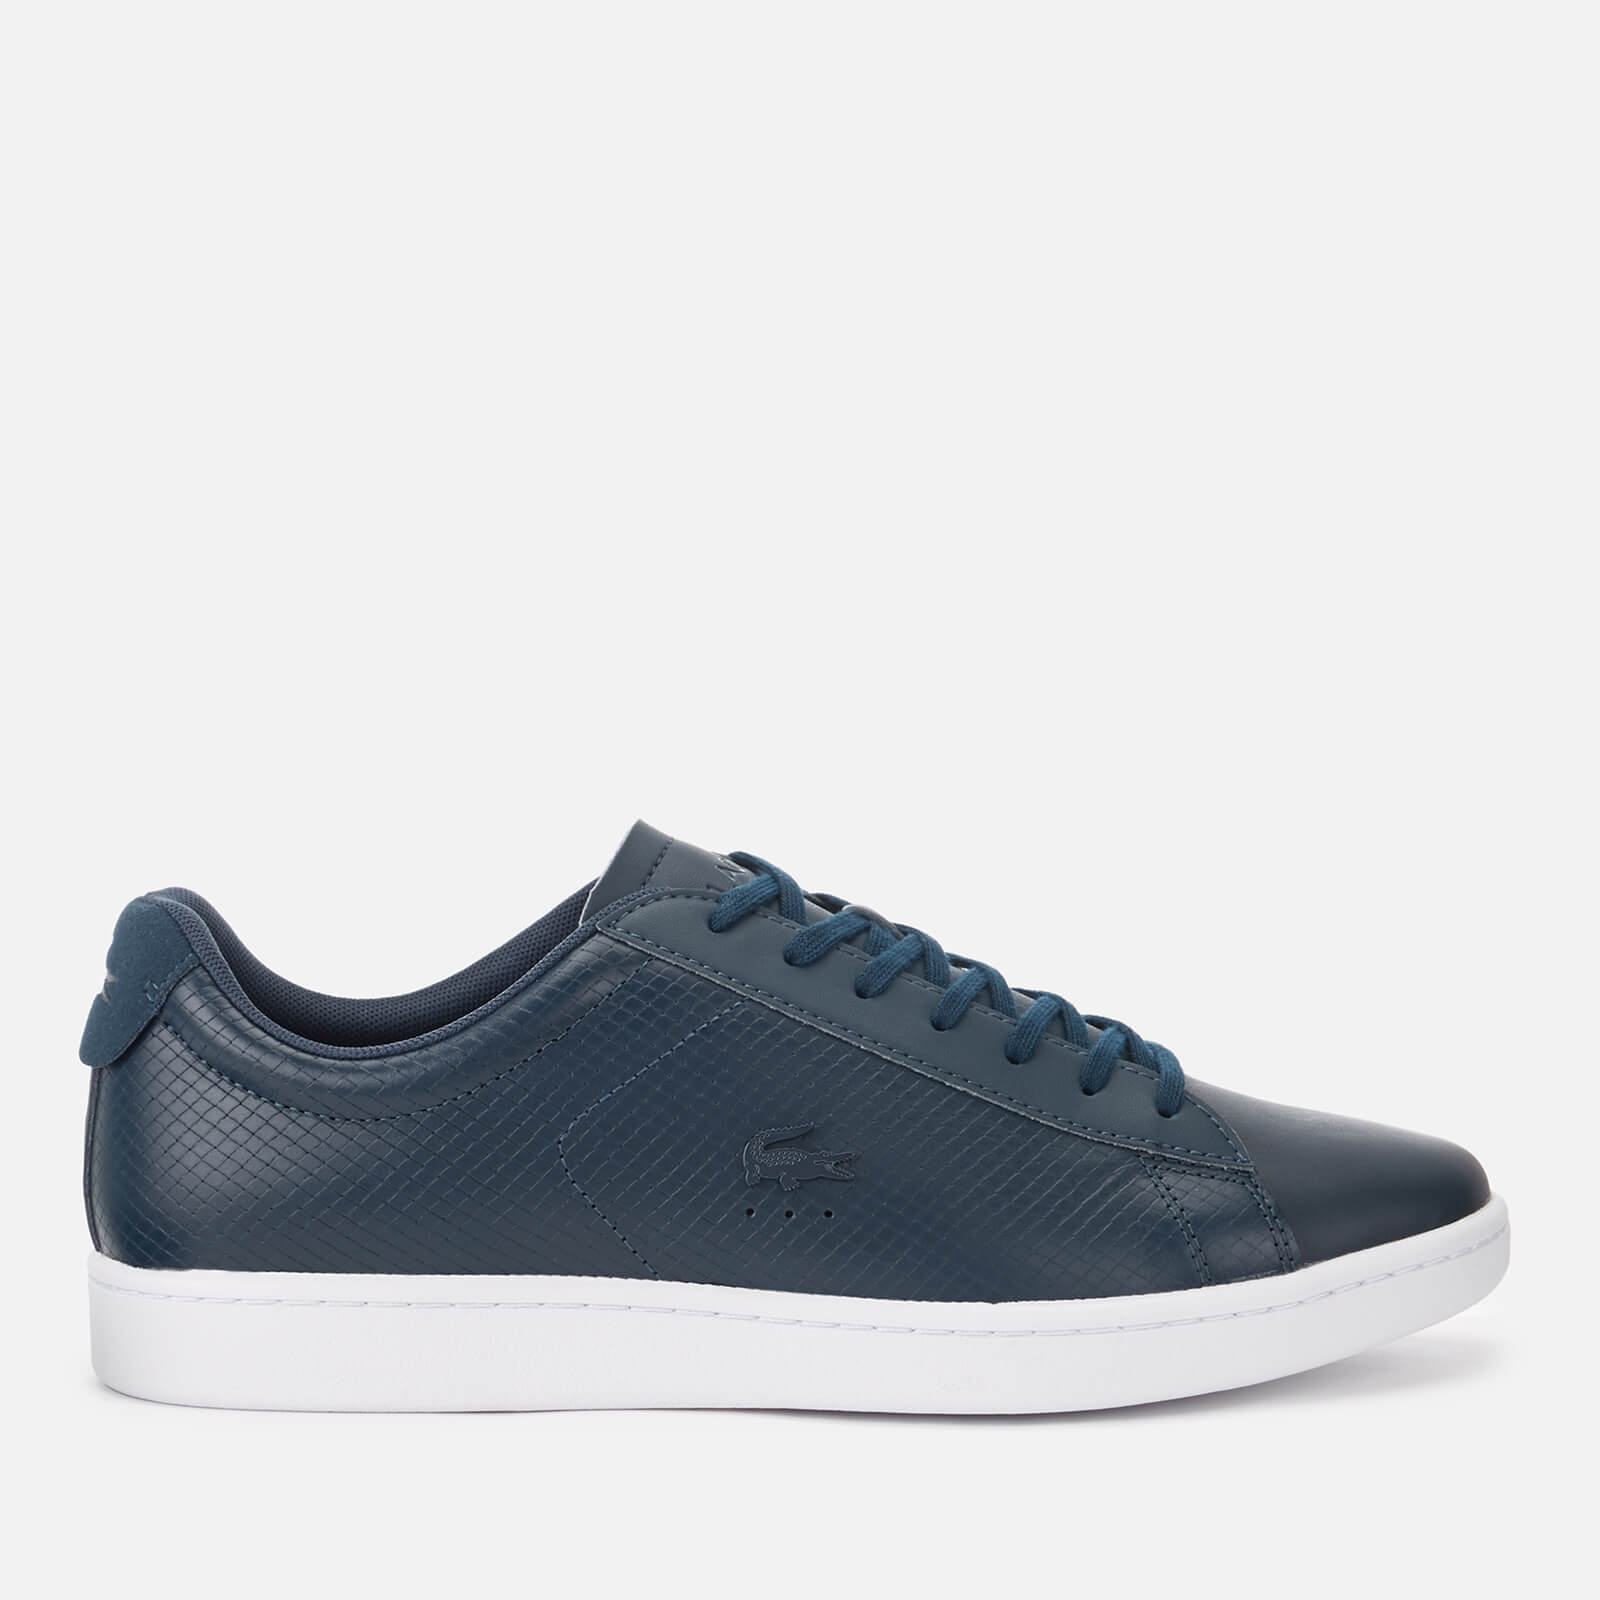 5940faaa6 Lacoste Men s Carnaby Evo 318 7 Croc Leather Trainers - Navy Mens Footwear